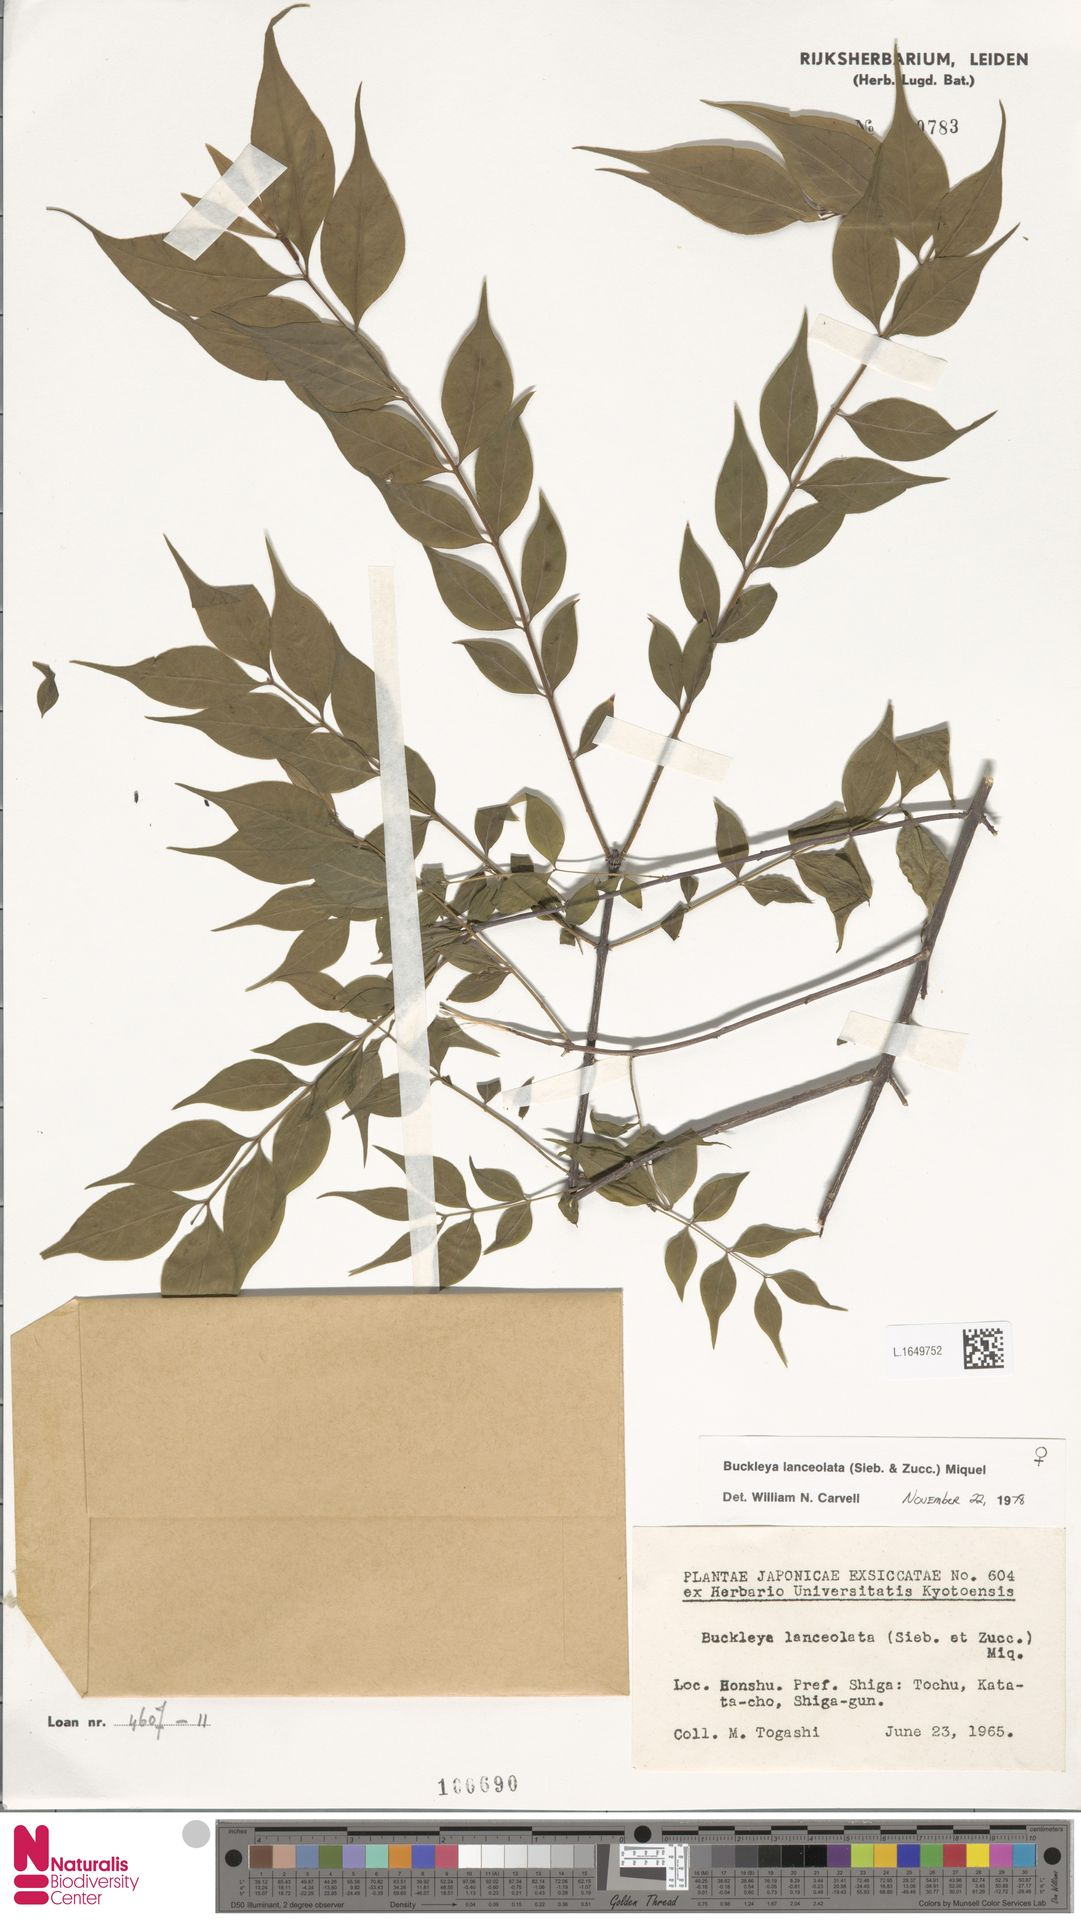 L.1649752   Buckleya lanceolata (Siebold & Zucc.) Miq.